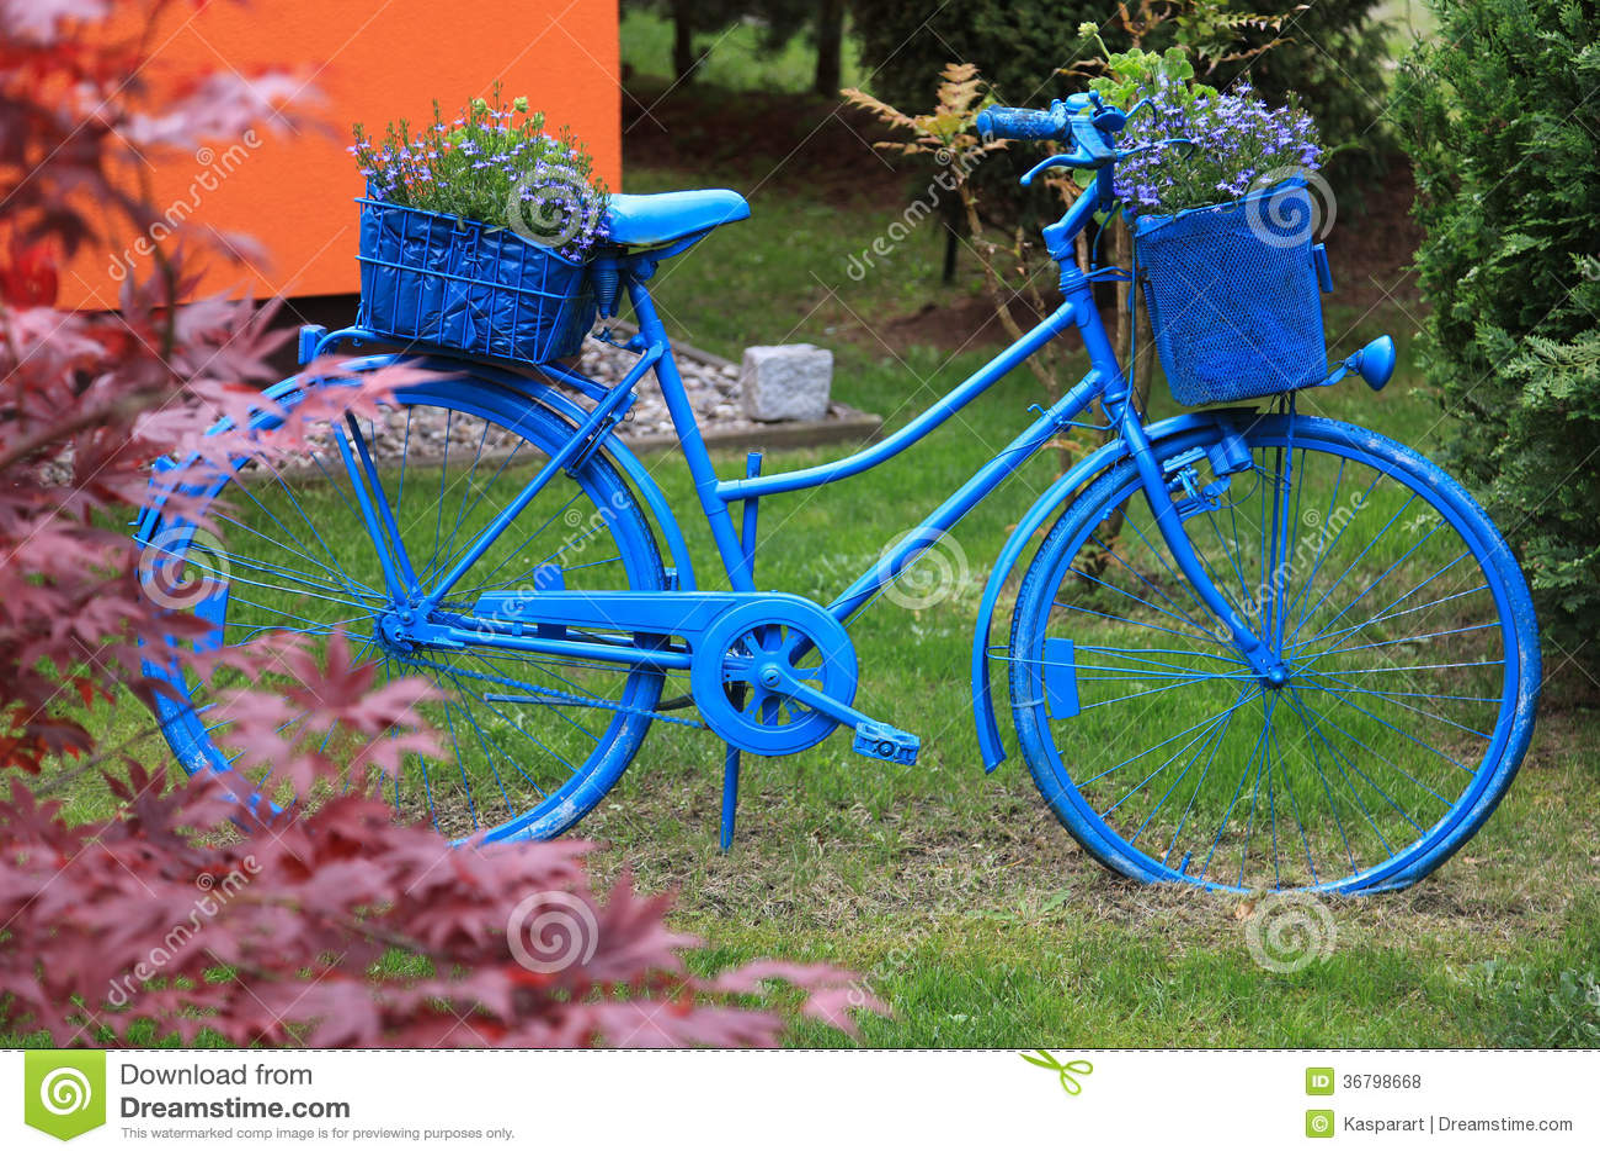 Garden Decoration Bicycle